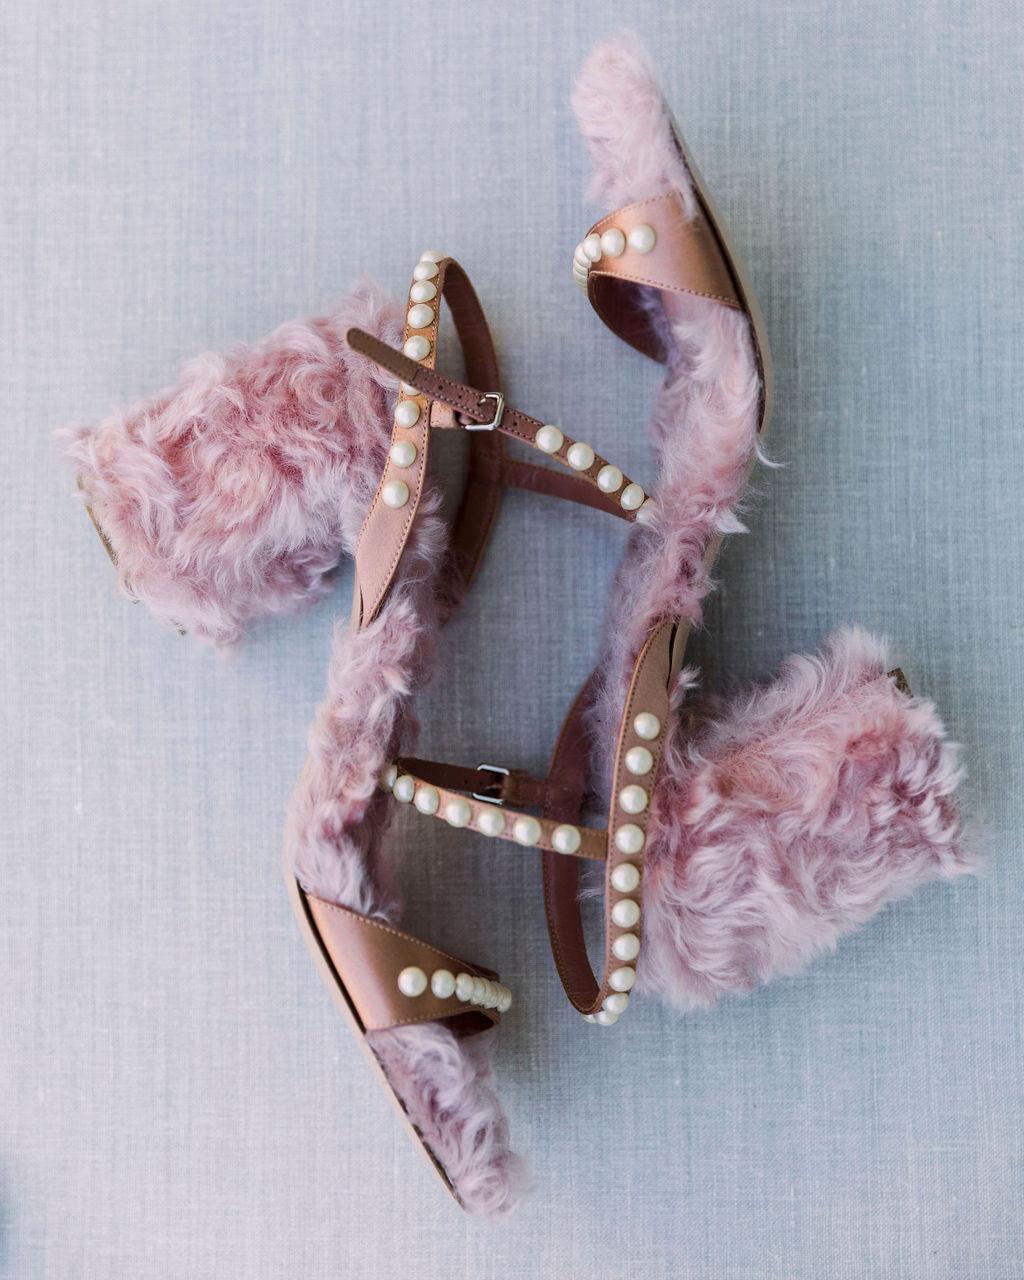 dalila elliot wedding furry bride's shoes